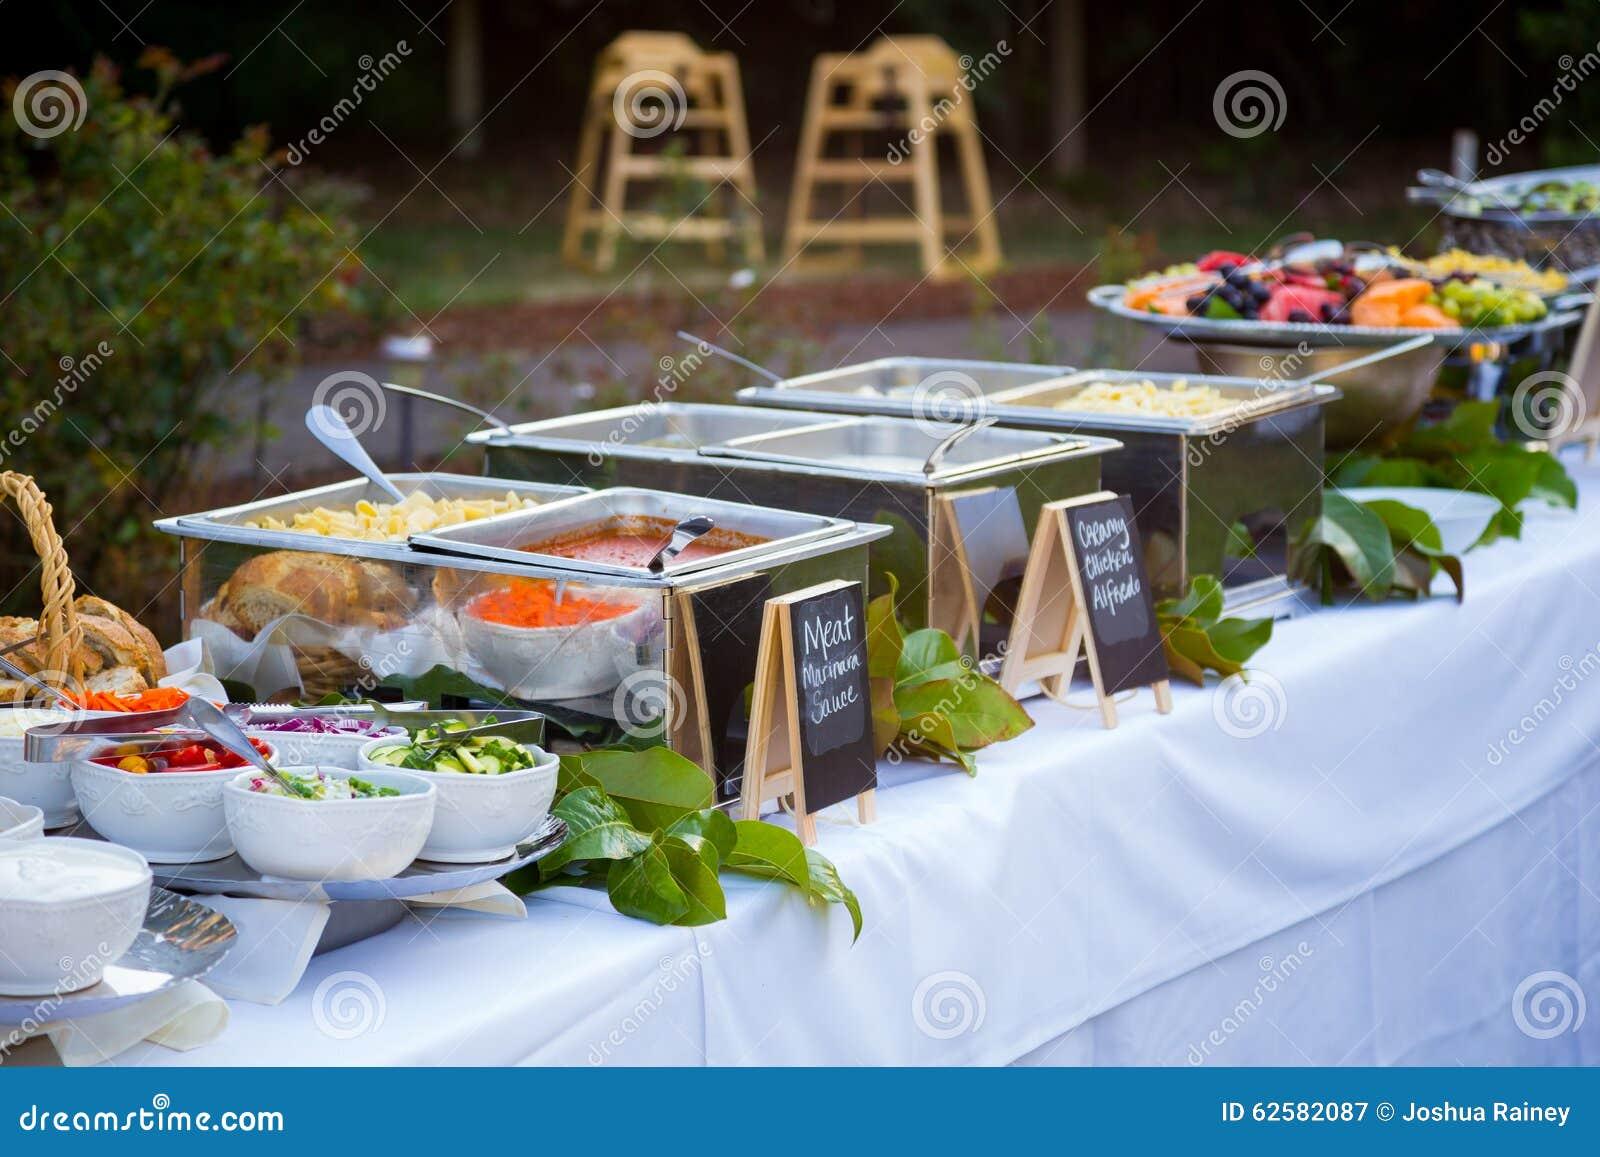 Wedding Reception Buffet Dinner Stock Image Image Of Wedding